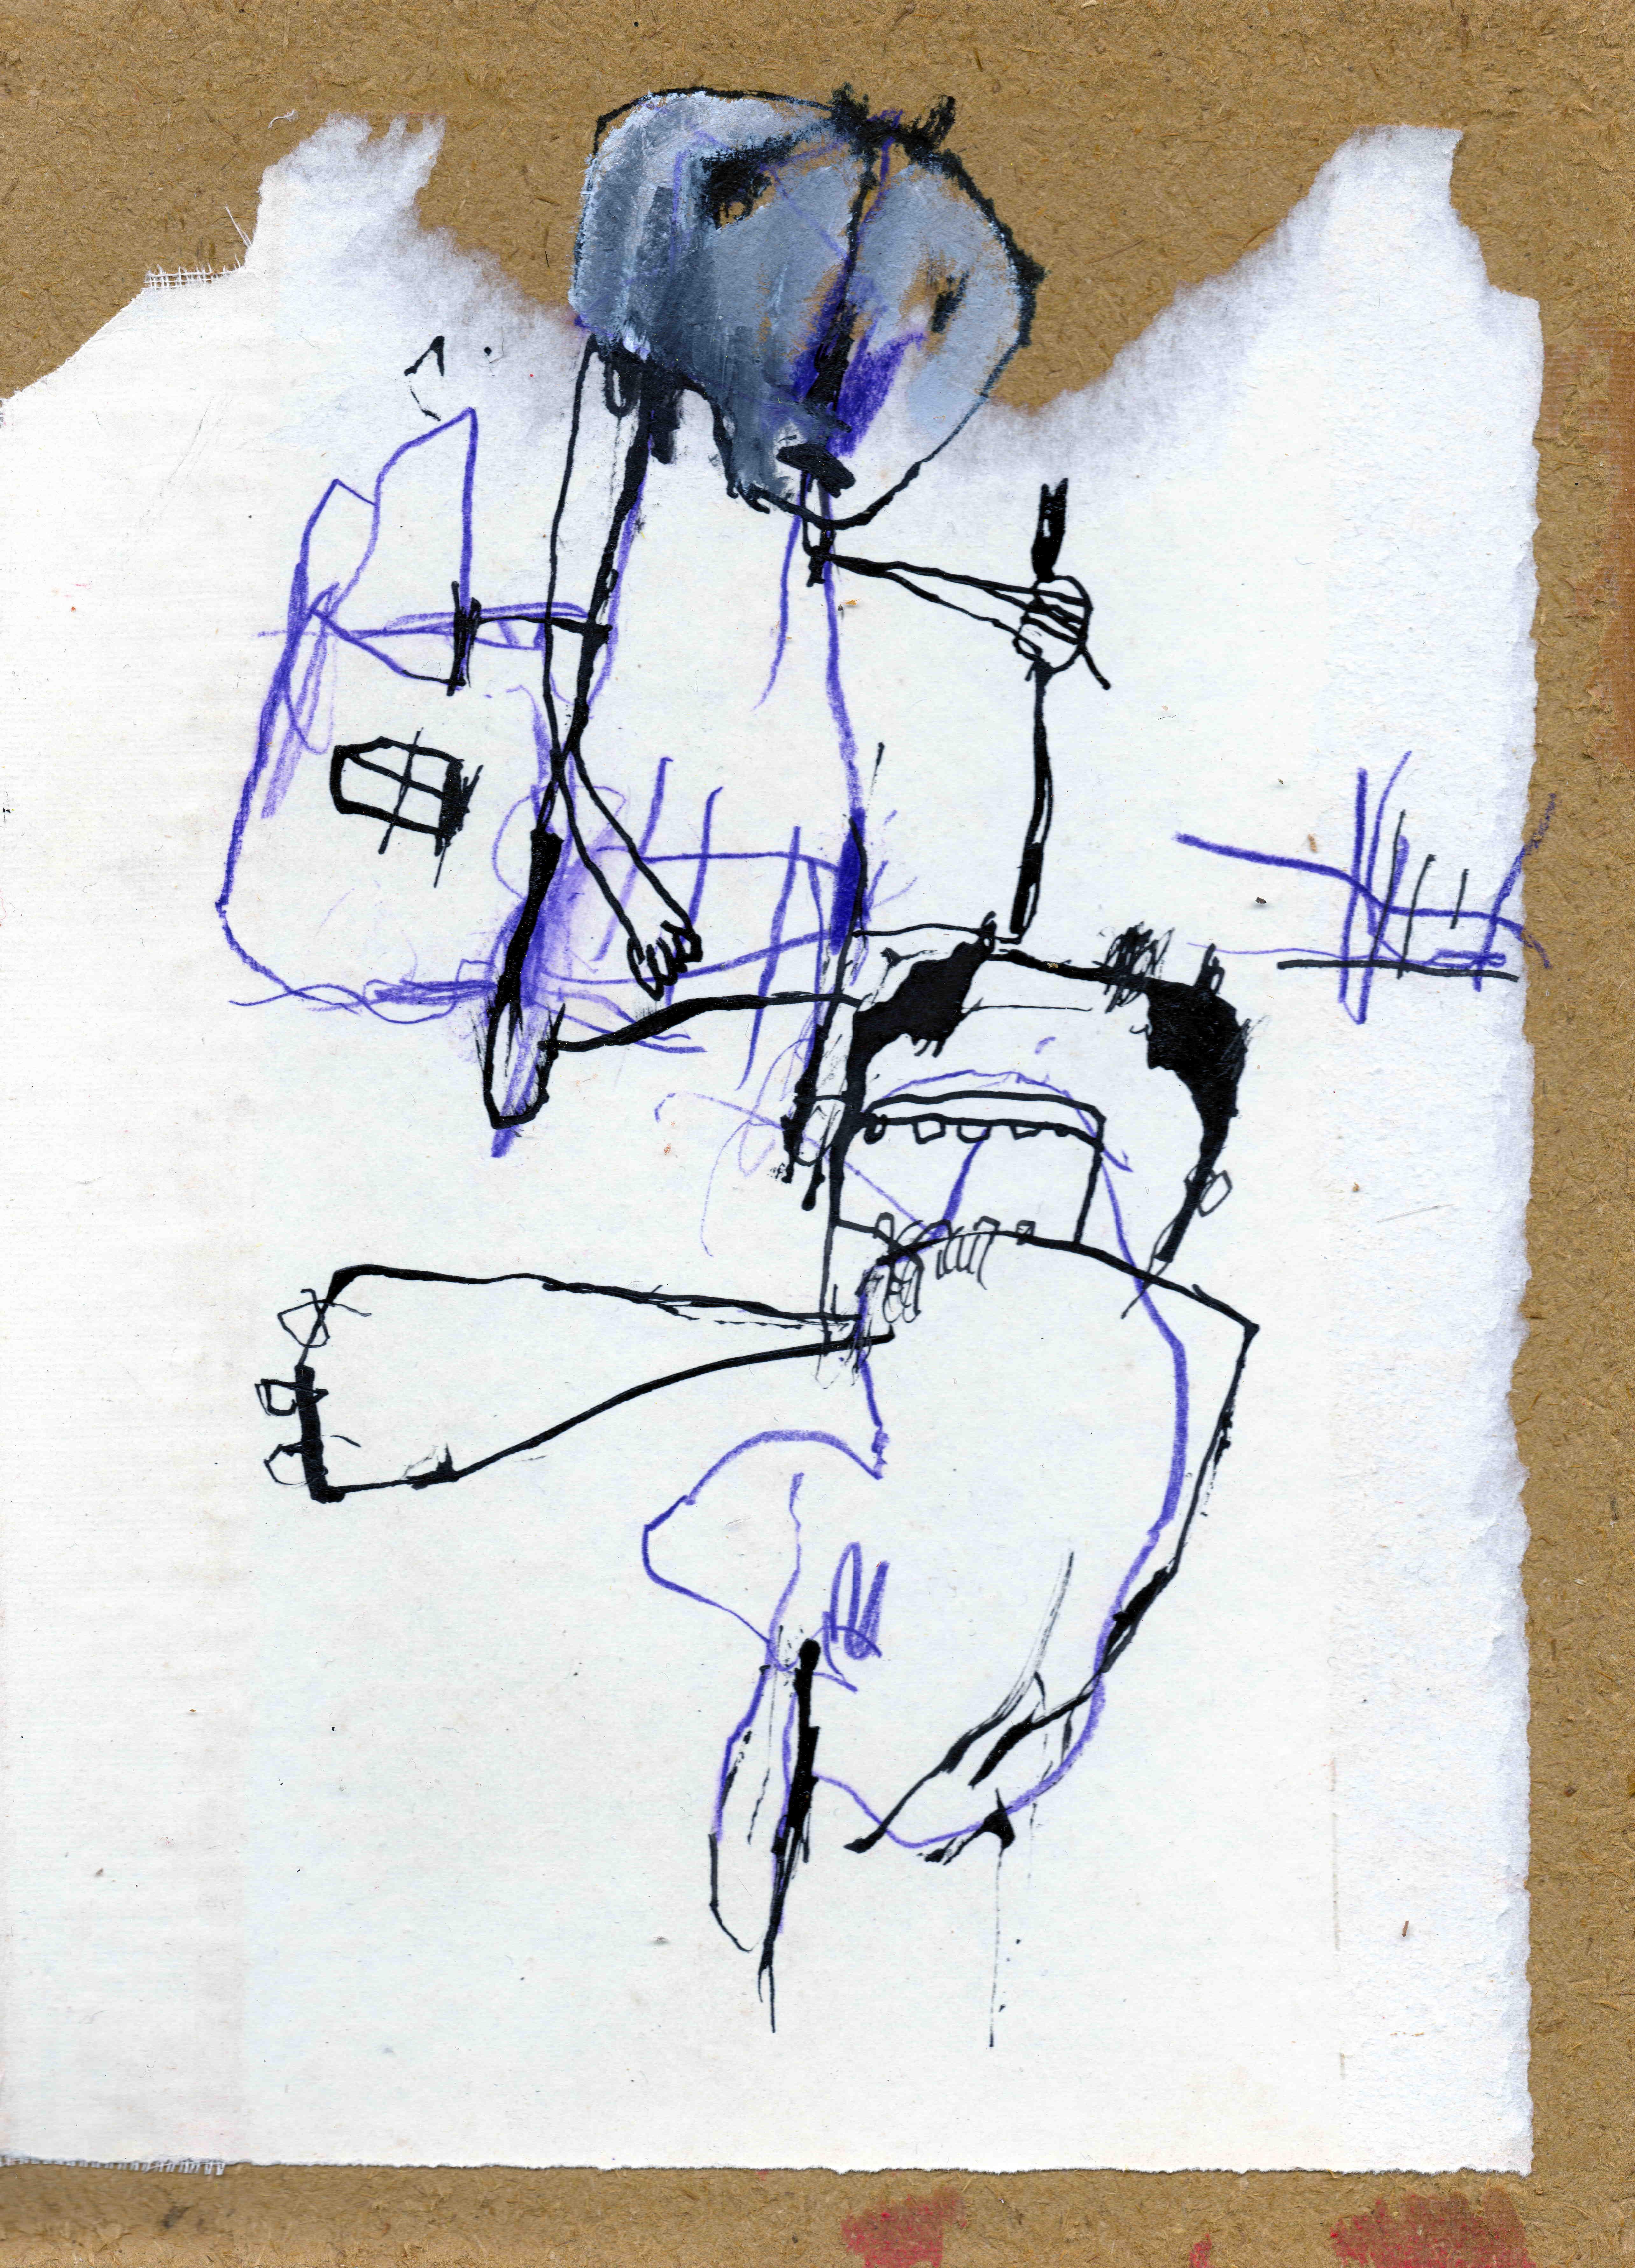 MH14 De verlosser, mixed media on card board, 18,5 x 25,4 cm, 2019